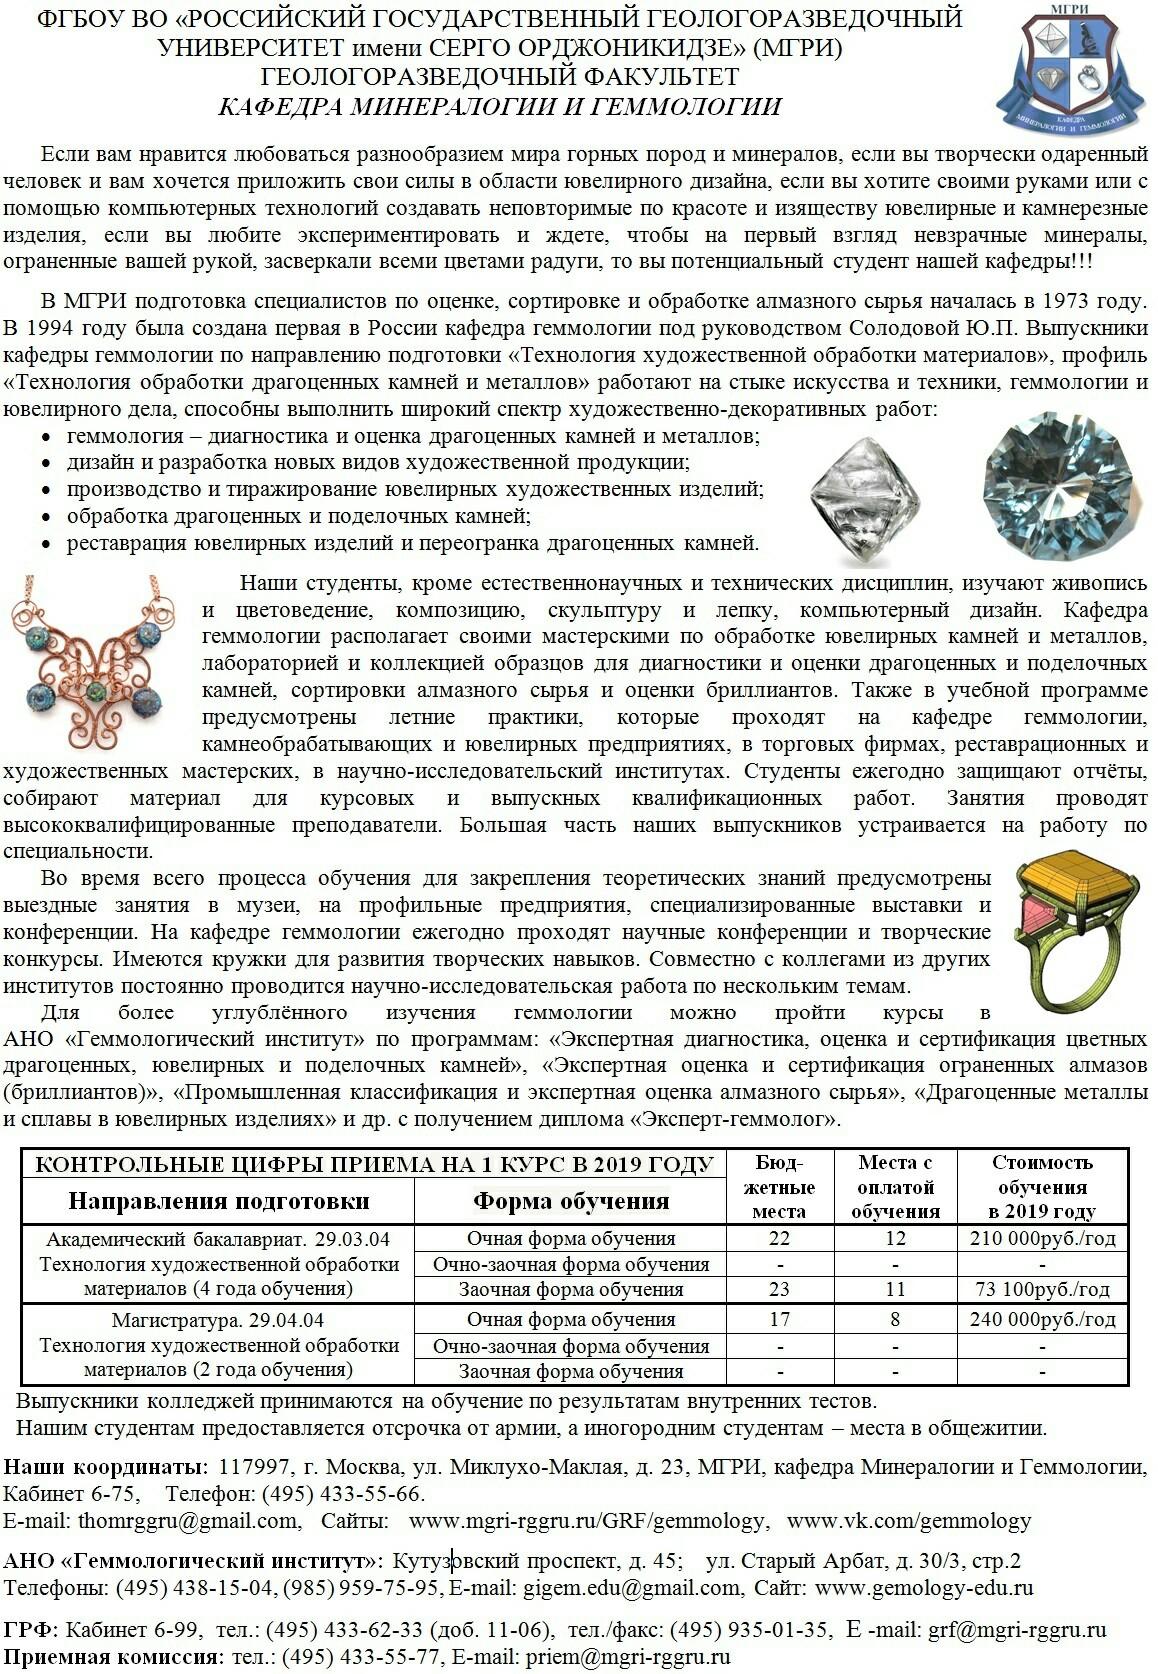 Агитка за геммологию РГГРУ-МГРИ